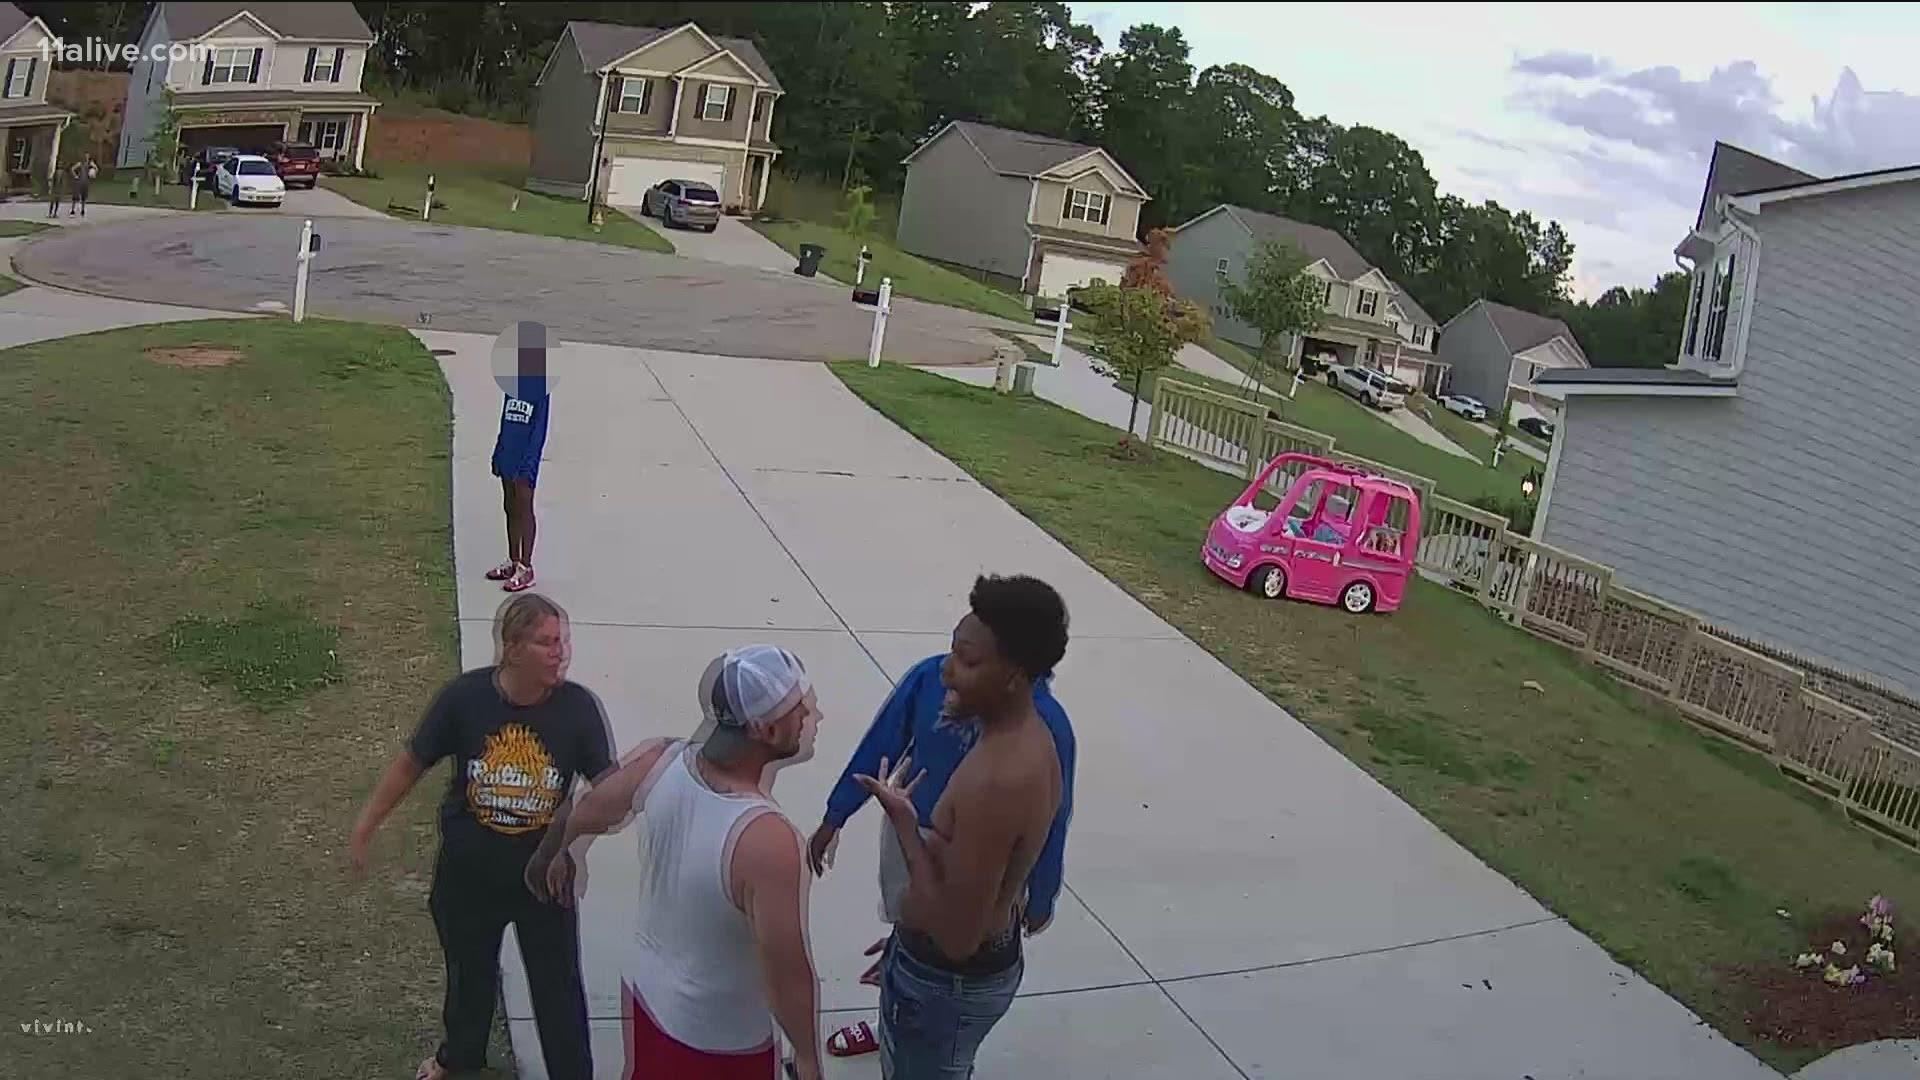 Disturbing: Man beats neighbors child with a belt 7/13/21